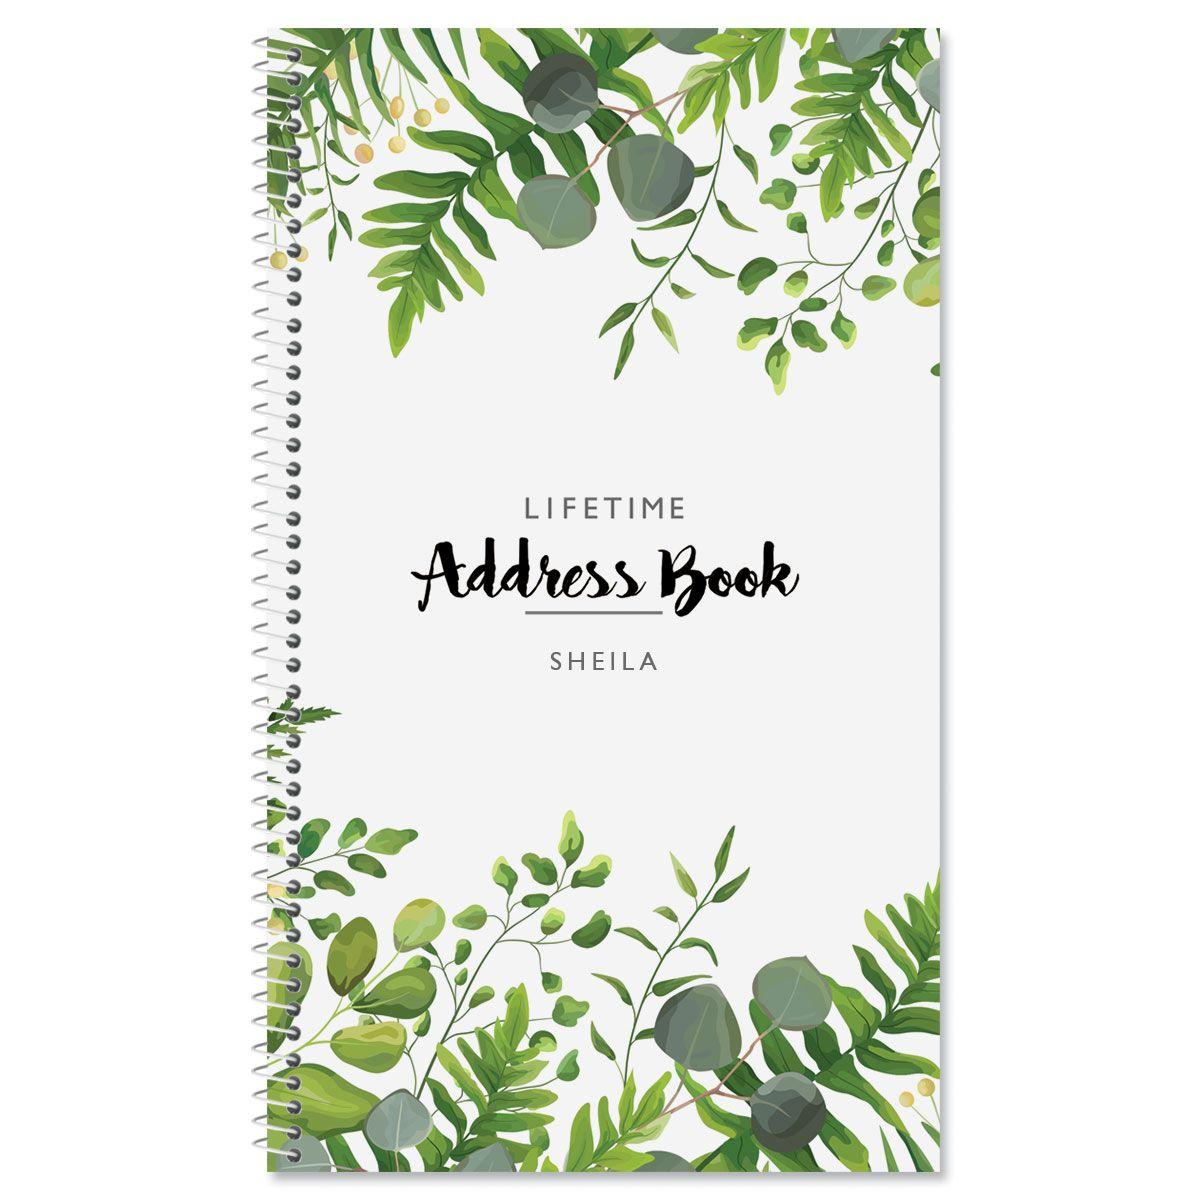 Hanging Leaves Lifetime Address Book